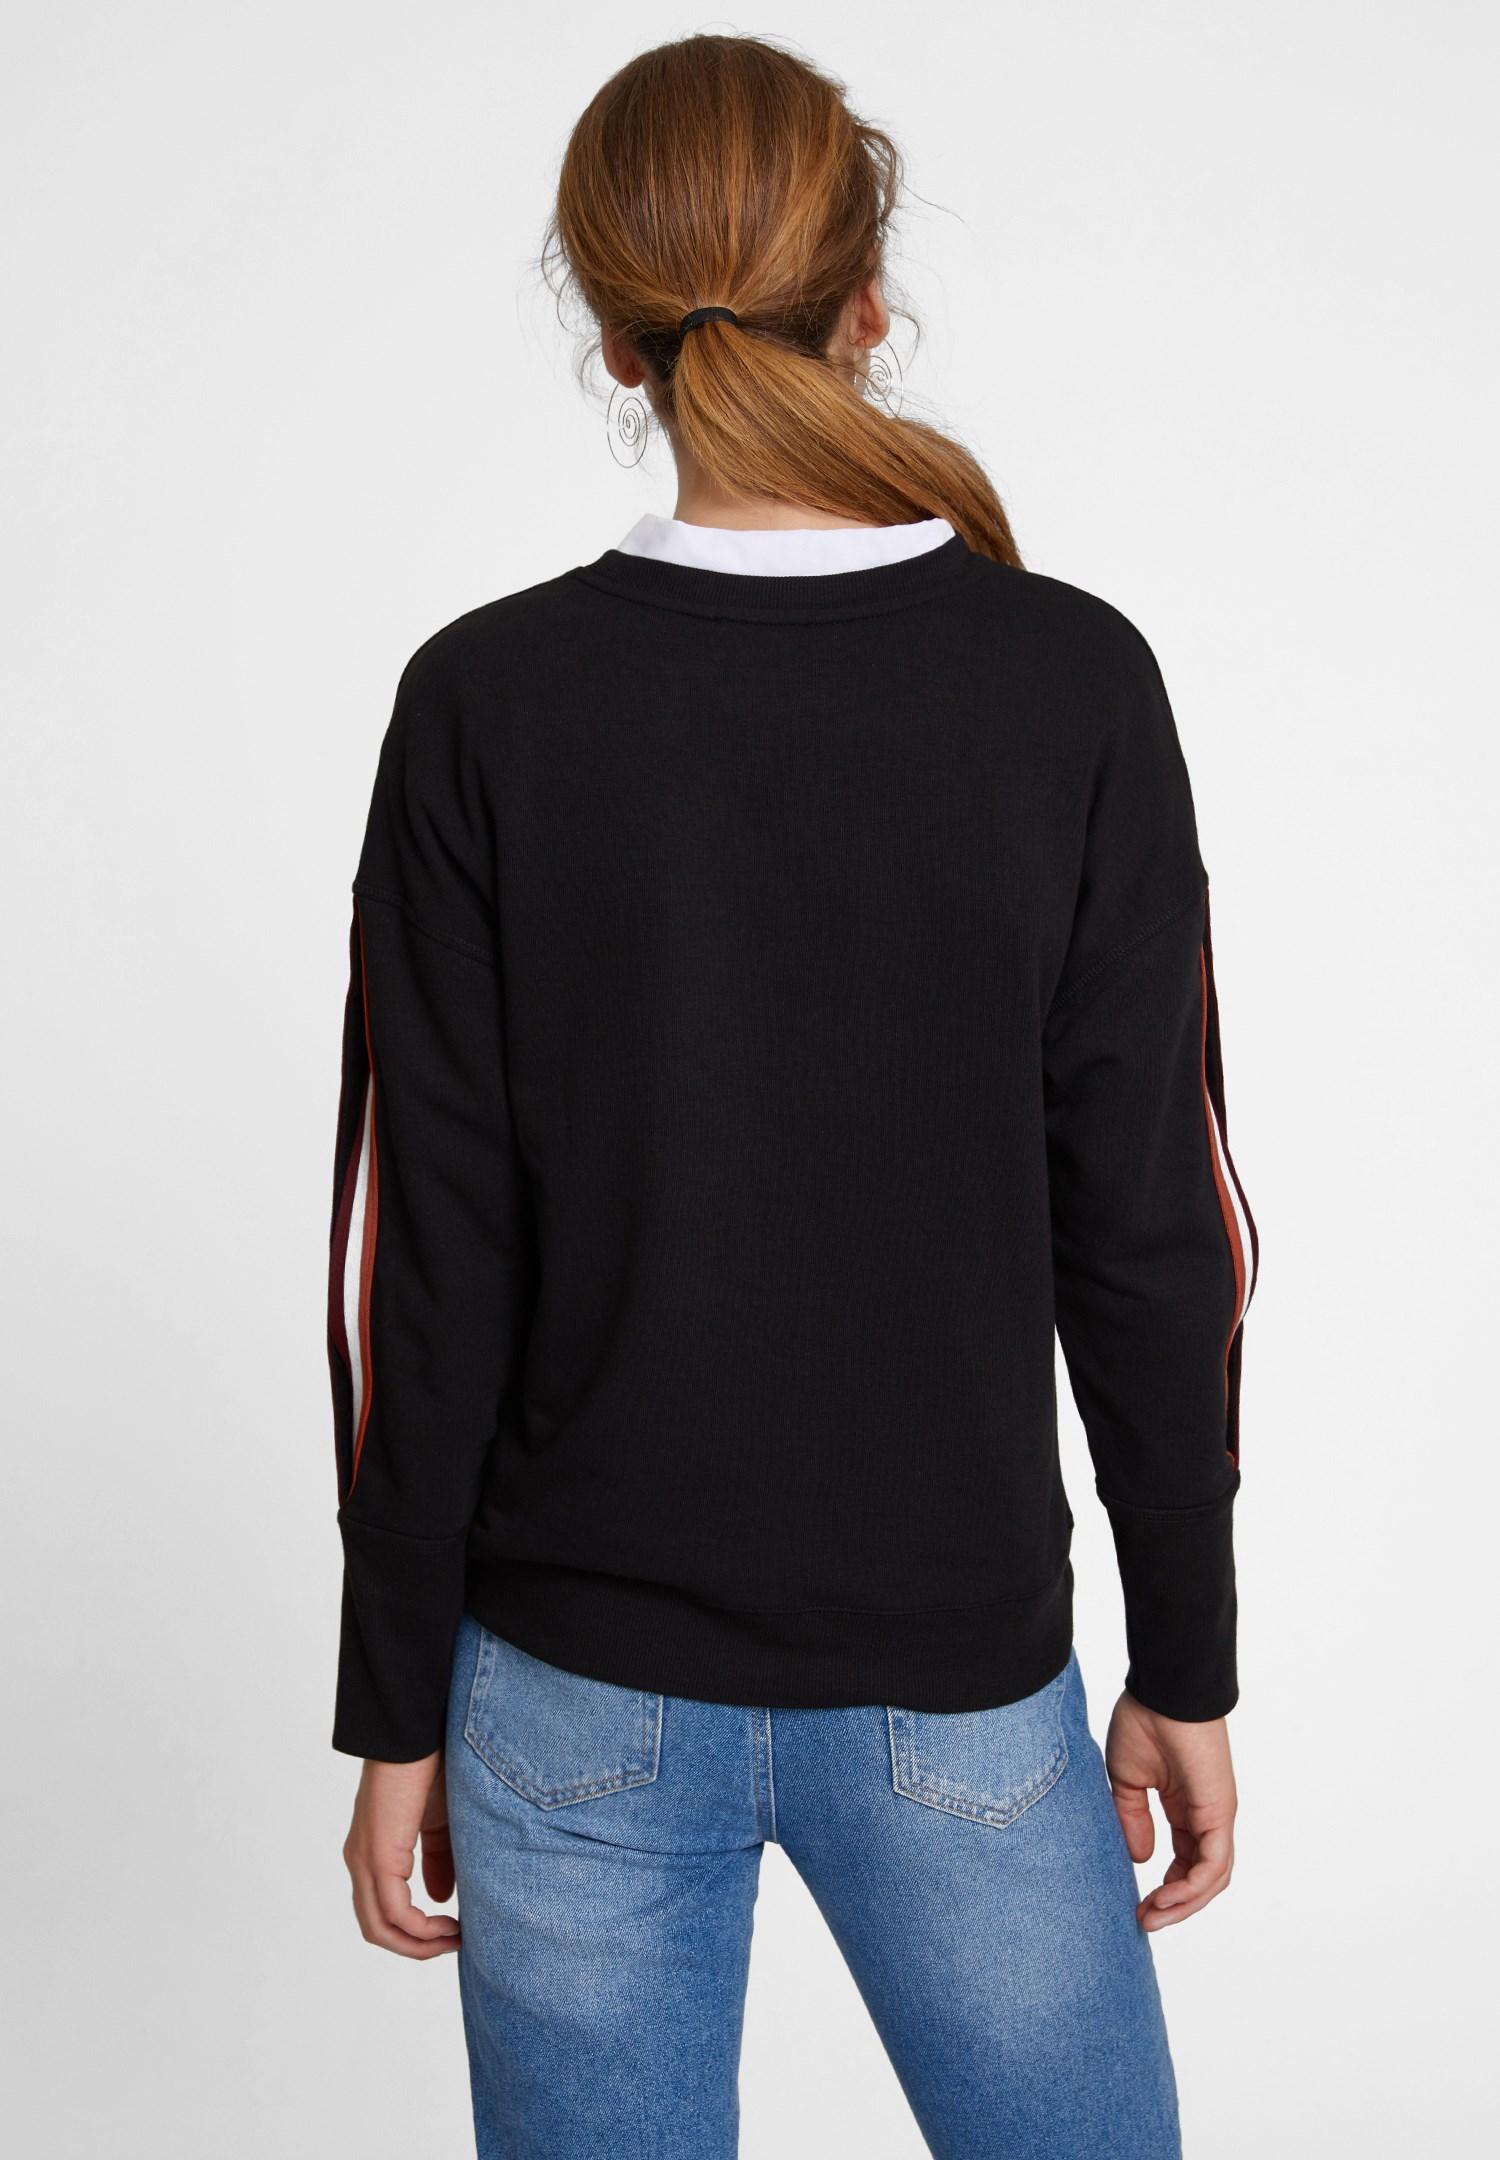 Bayan Siyah Kolları Şeritli Sweatshirt